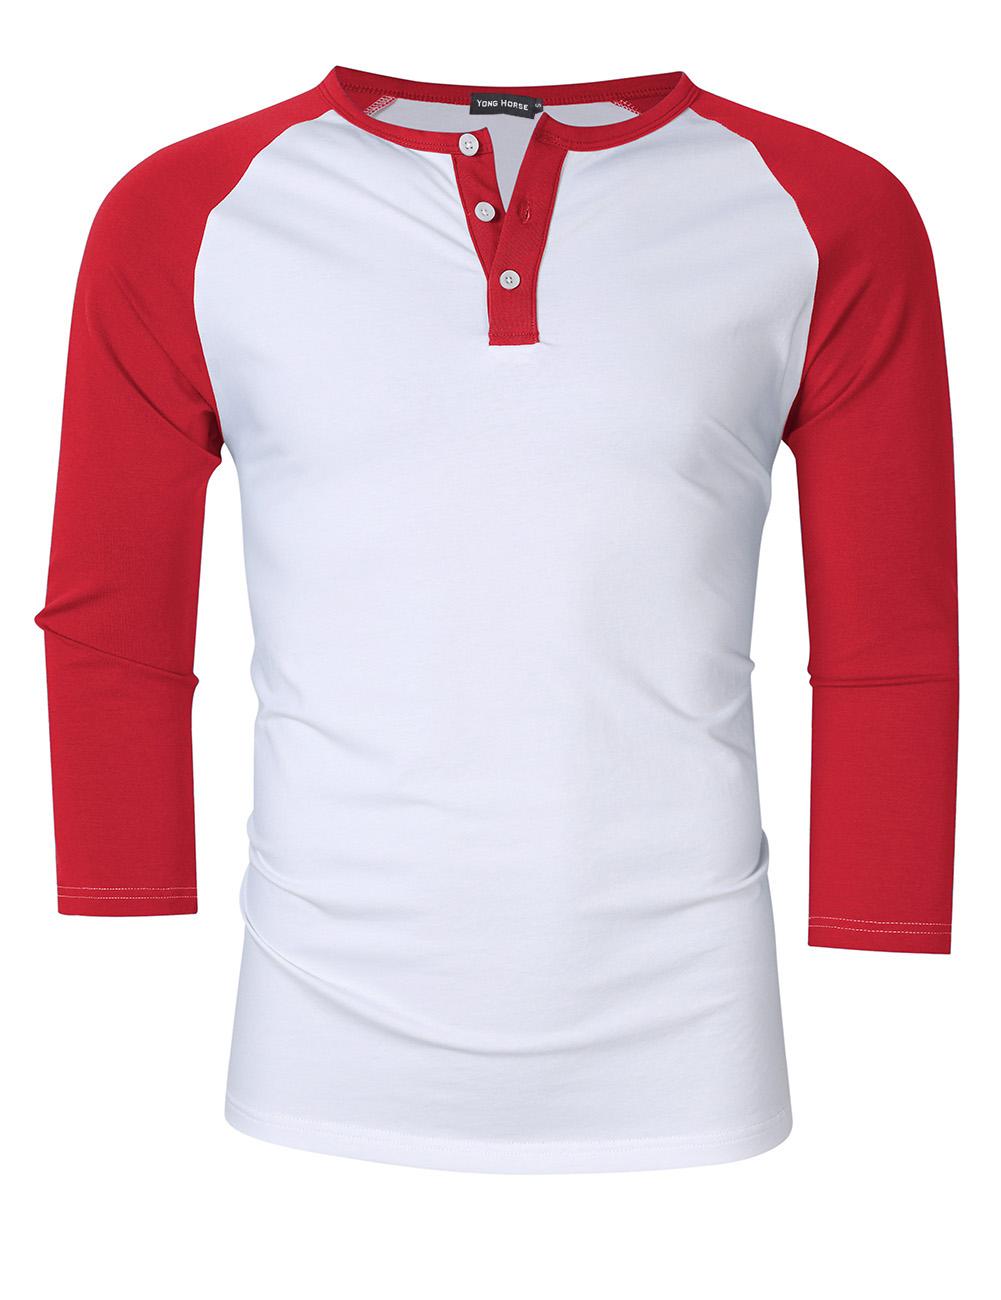 [US Direct] Yong Horse Men's Casual Slim Fit Baseball Raglan 3/4 Sleeve Henley Shirt White-red_S